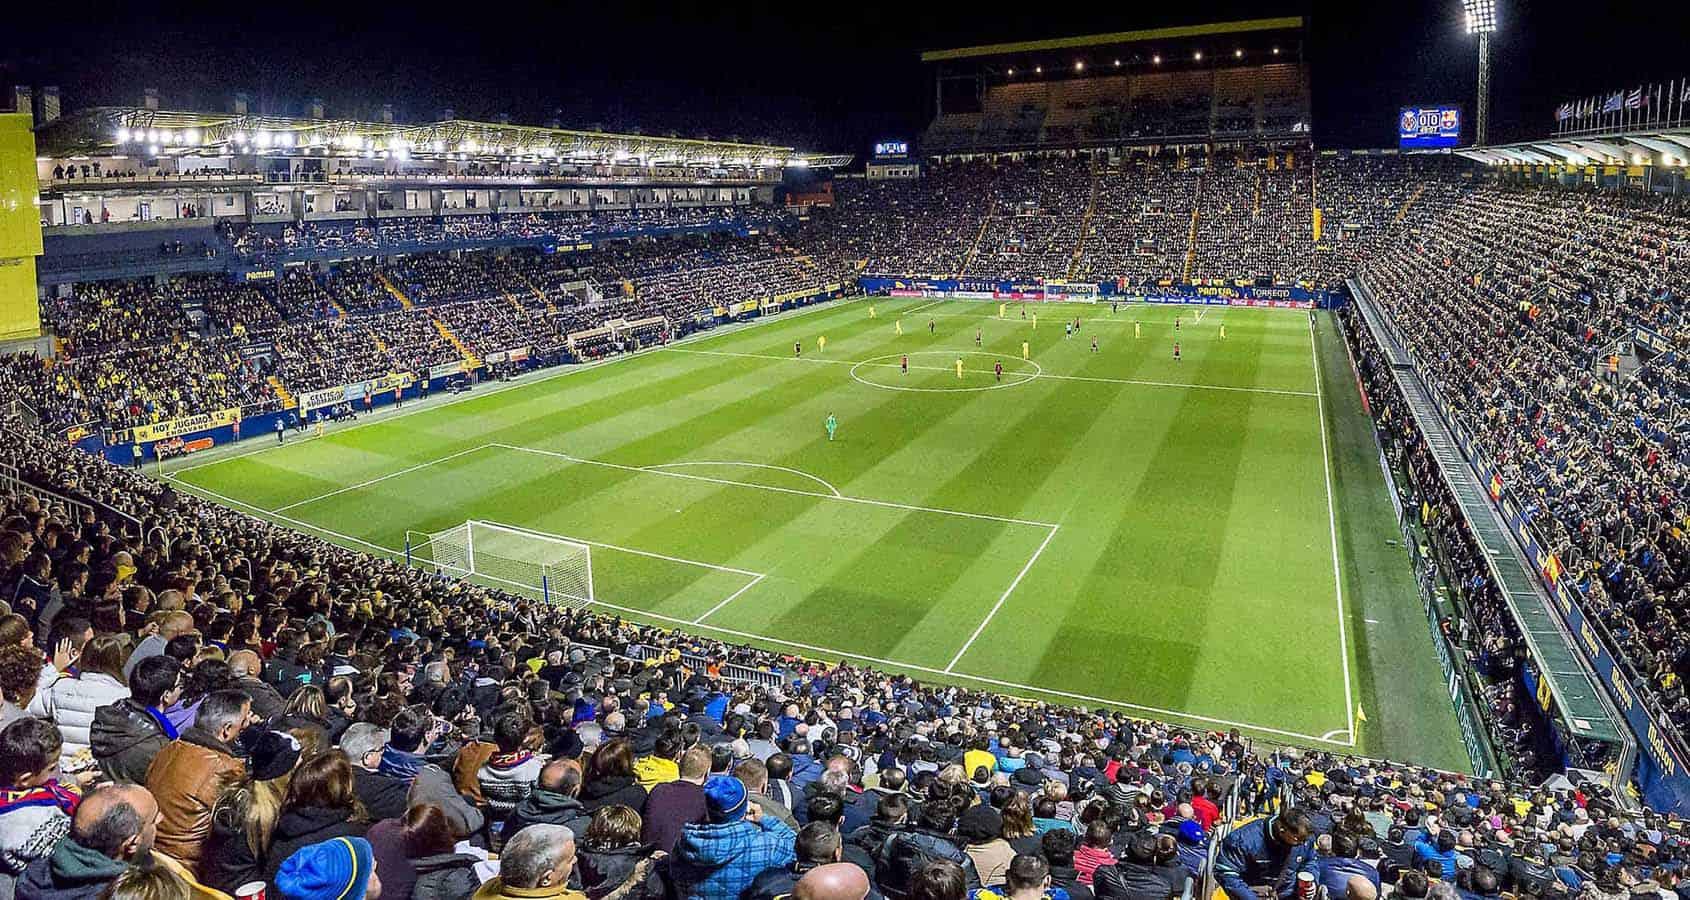 Fotbollsresor, Villarreal CF Biljetter, La Liga, Spanien, Vila-Real, Estadio de La Cerámica